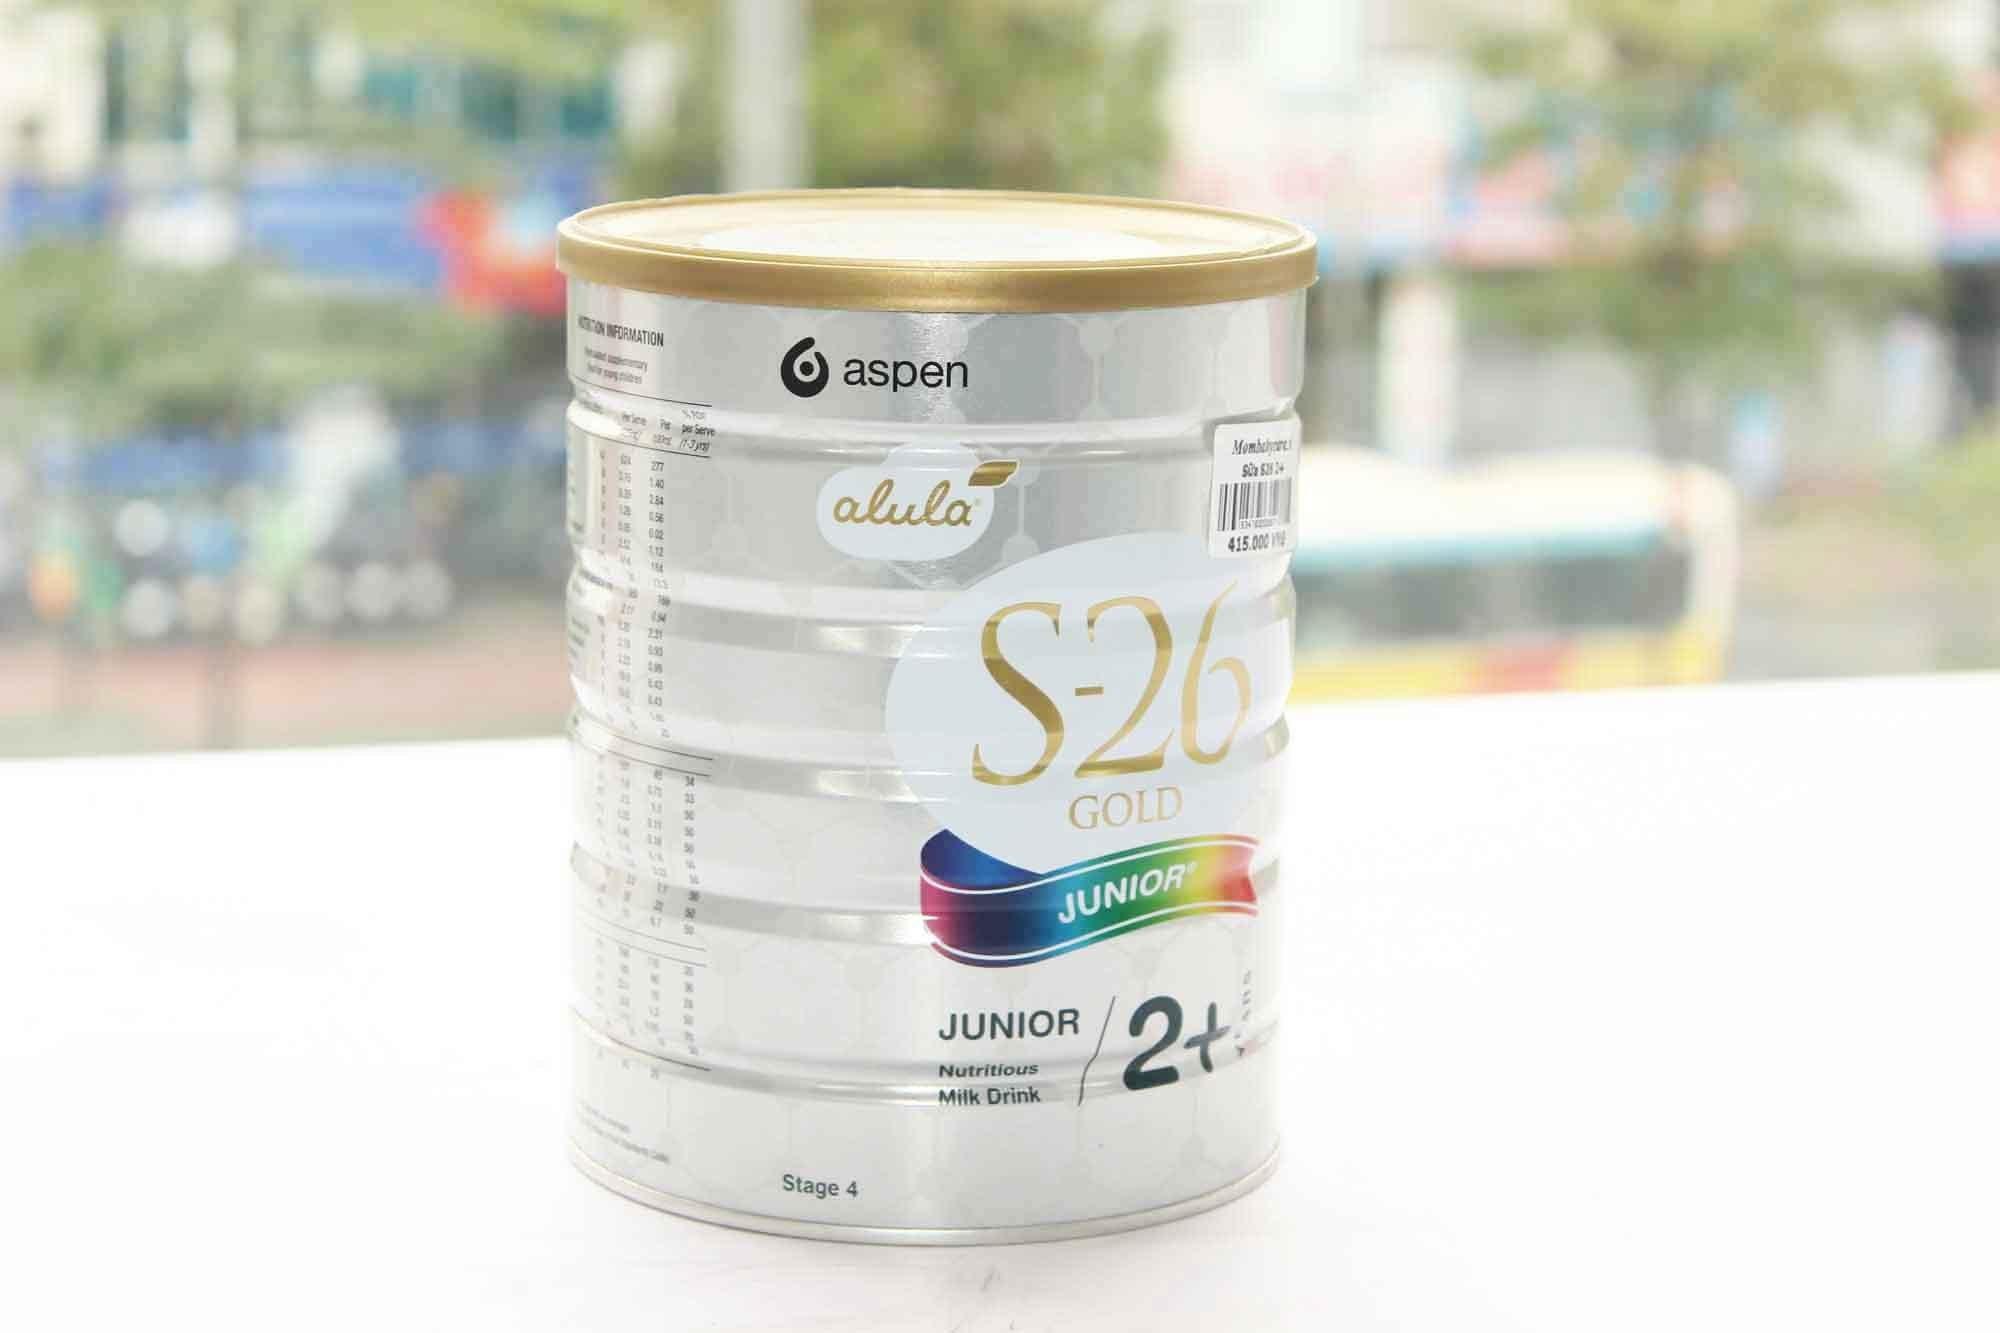 sữa s26, cách pha sữa s26, review sữa s26, giá sữa s26, ưu nhược điểm của sữa s26, sữa s26 1+, cách pha sữa s26 số 2, đánh giá sữa s26, sữa s26 gold số 3, review sữa s26 úc, sữa s26 úc, sữa s26 của úc, sữa s26 có tốt không, sữa s26 có tăng cân không, sữa s26 gold, sữa s26 số 2, sữa s26 của úc có tăng cân không, sữa s26 số 3, Ưu nhược điểm của sữa Blackmore, Sữa S26 1, Sữa S26 2, Sữa S26 mẫu mới, sữa s26 0-6 tháng, sữa s26 review, sữa cho trẻ sơ sinh từ 0-6 tháng tuổi, sữa s26 tốt không, review s26, s26 review, sữa s26 úc có tốt không, sữa s26 cho bé 1 tuổi, s26